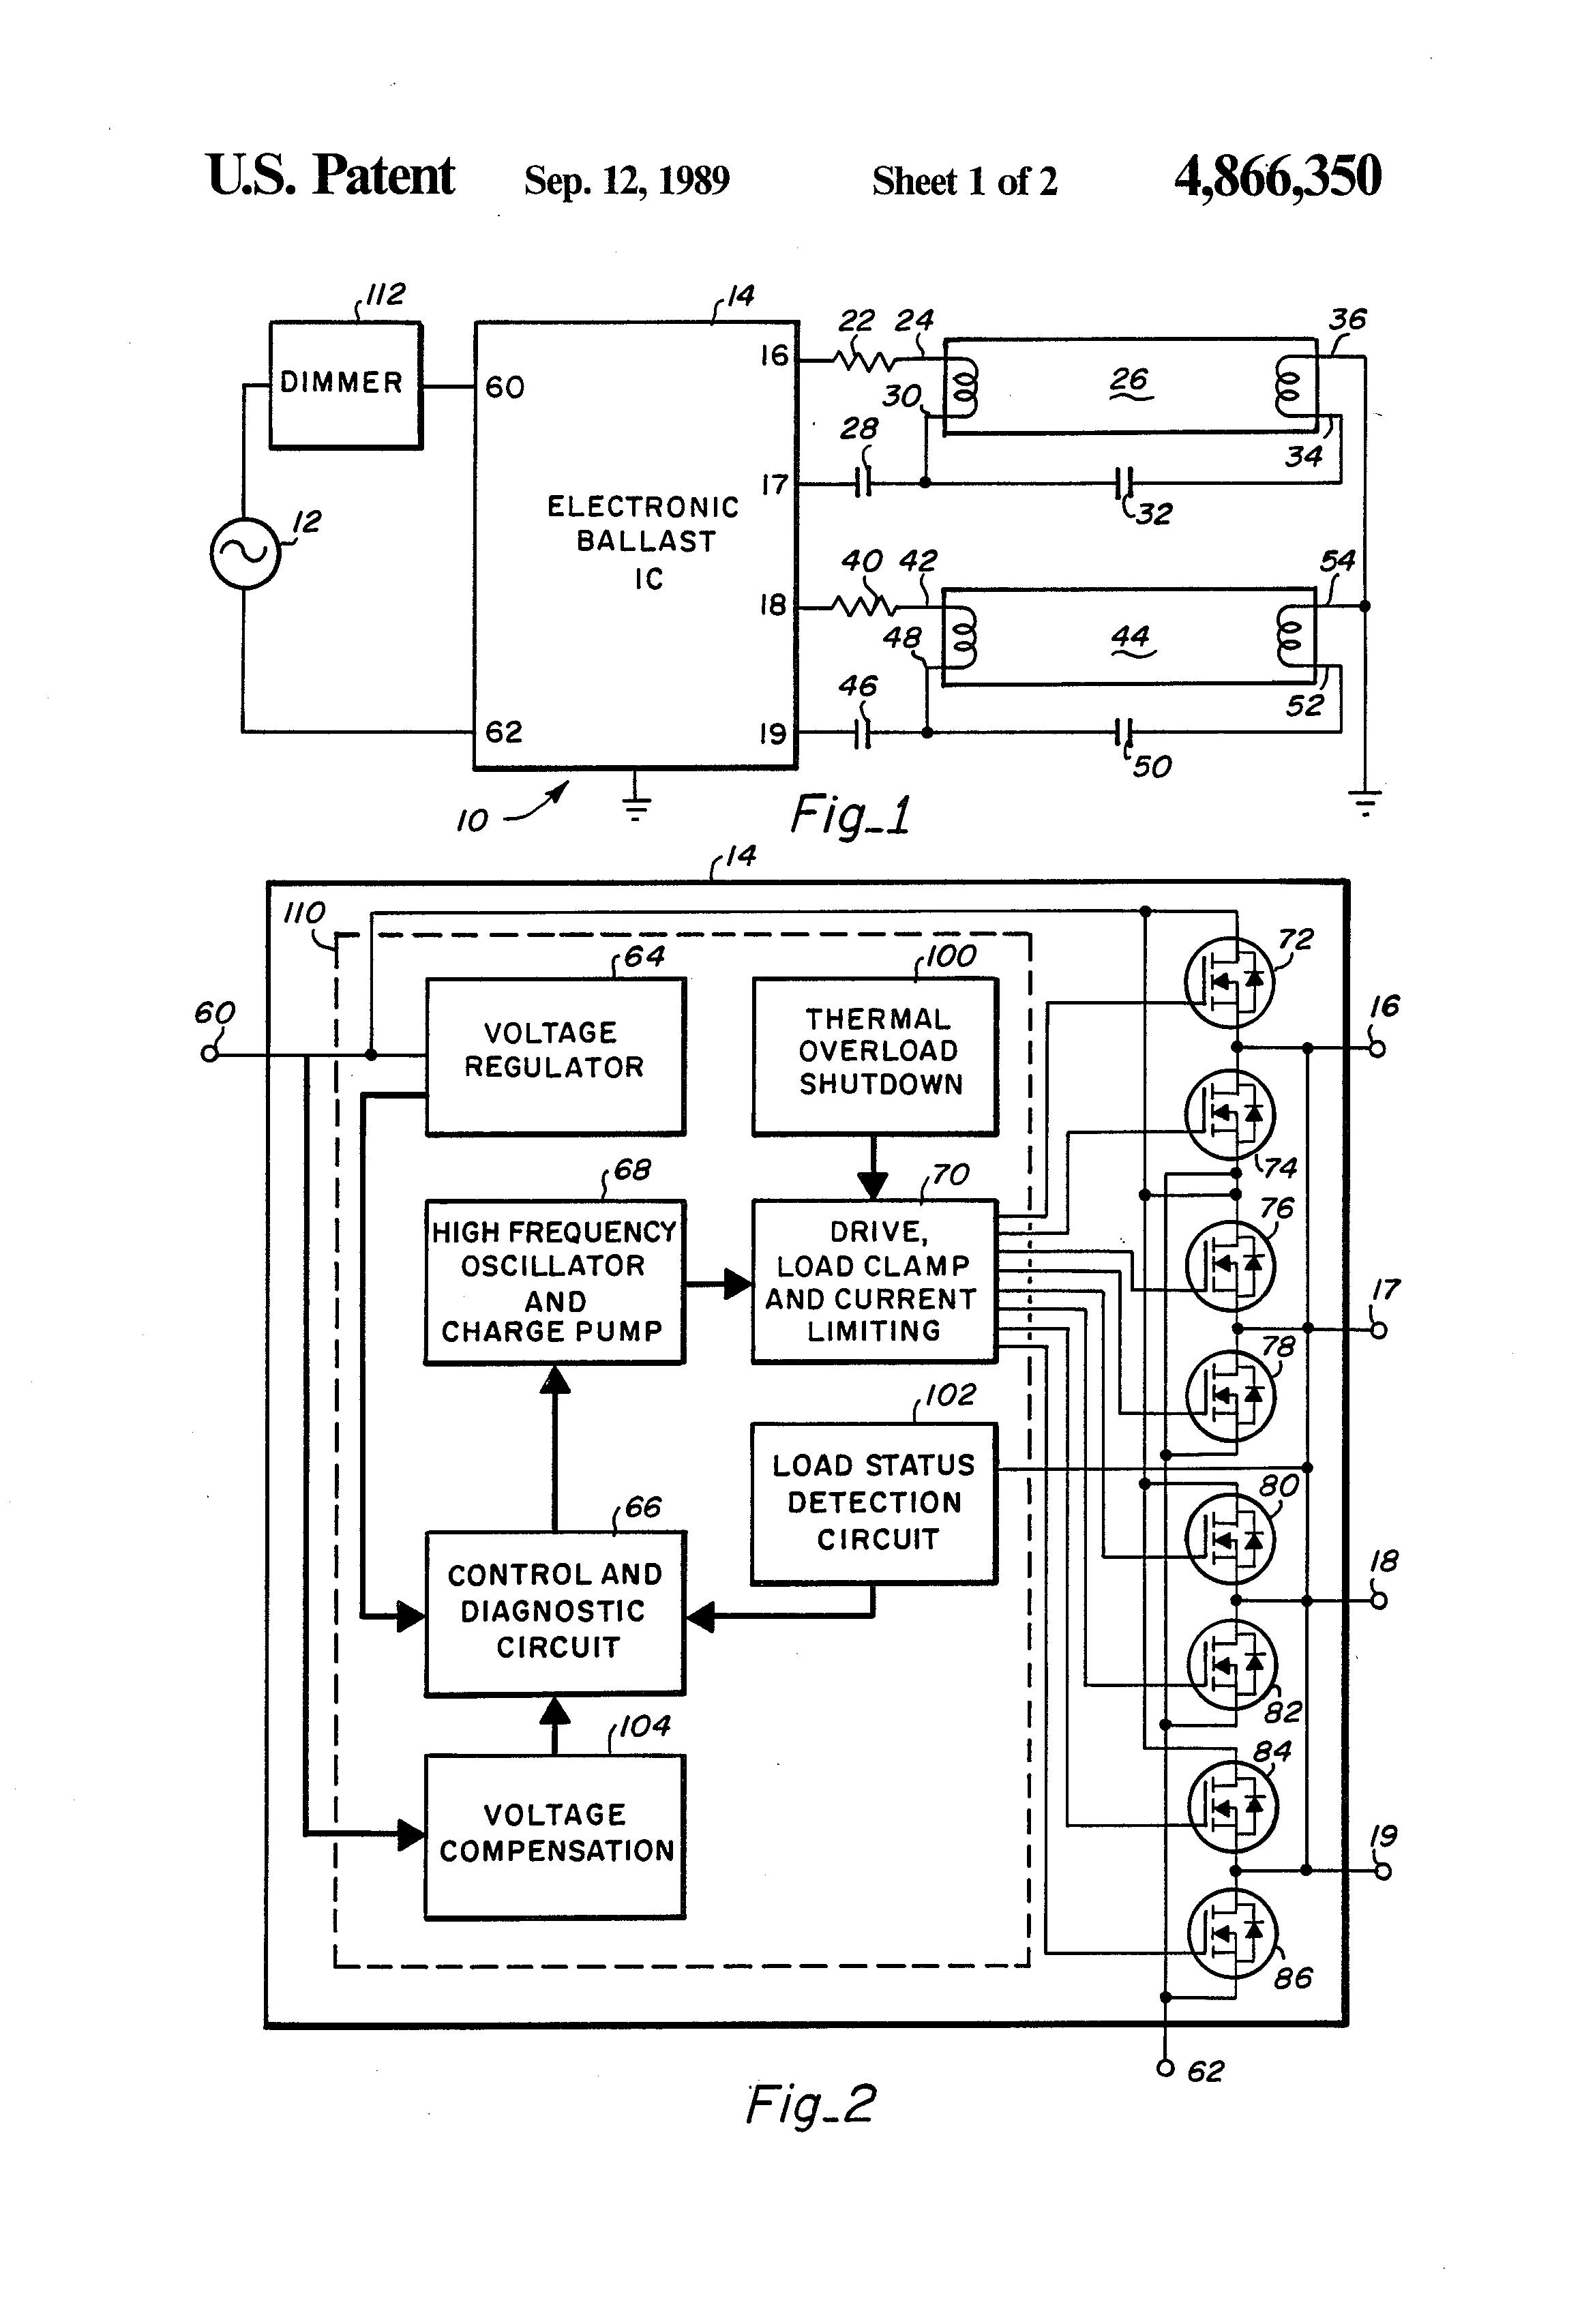 Ge Ballast Wiring Diagram For Sings 1994 Eldorado Wiring Diagram Begeboy Wiring Diagram Source